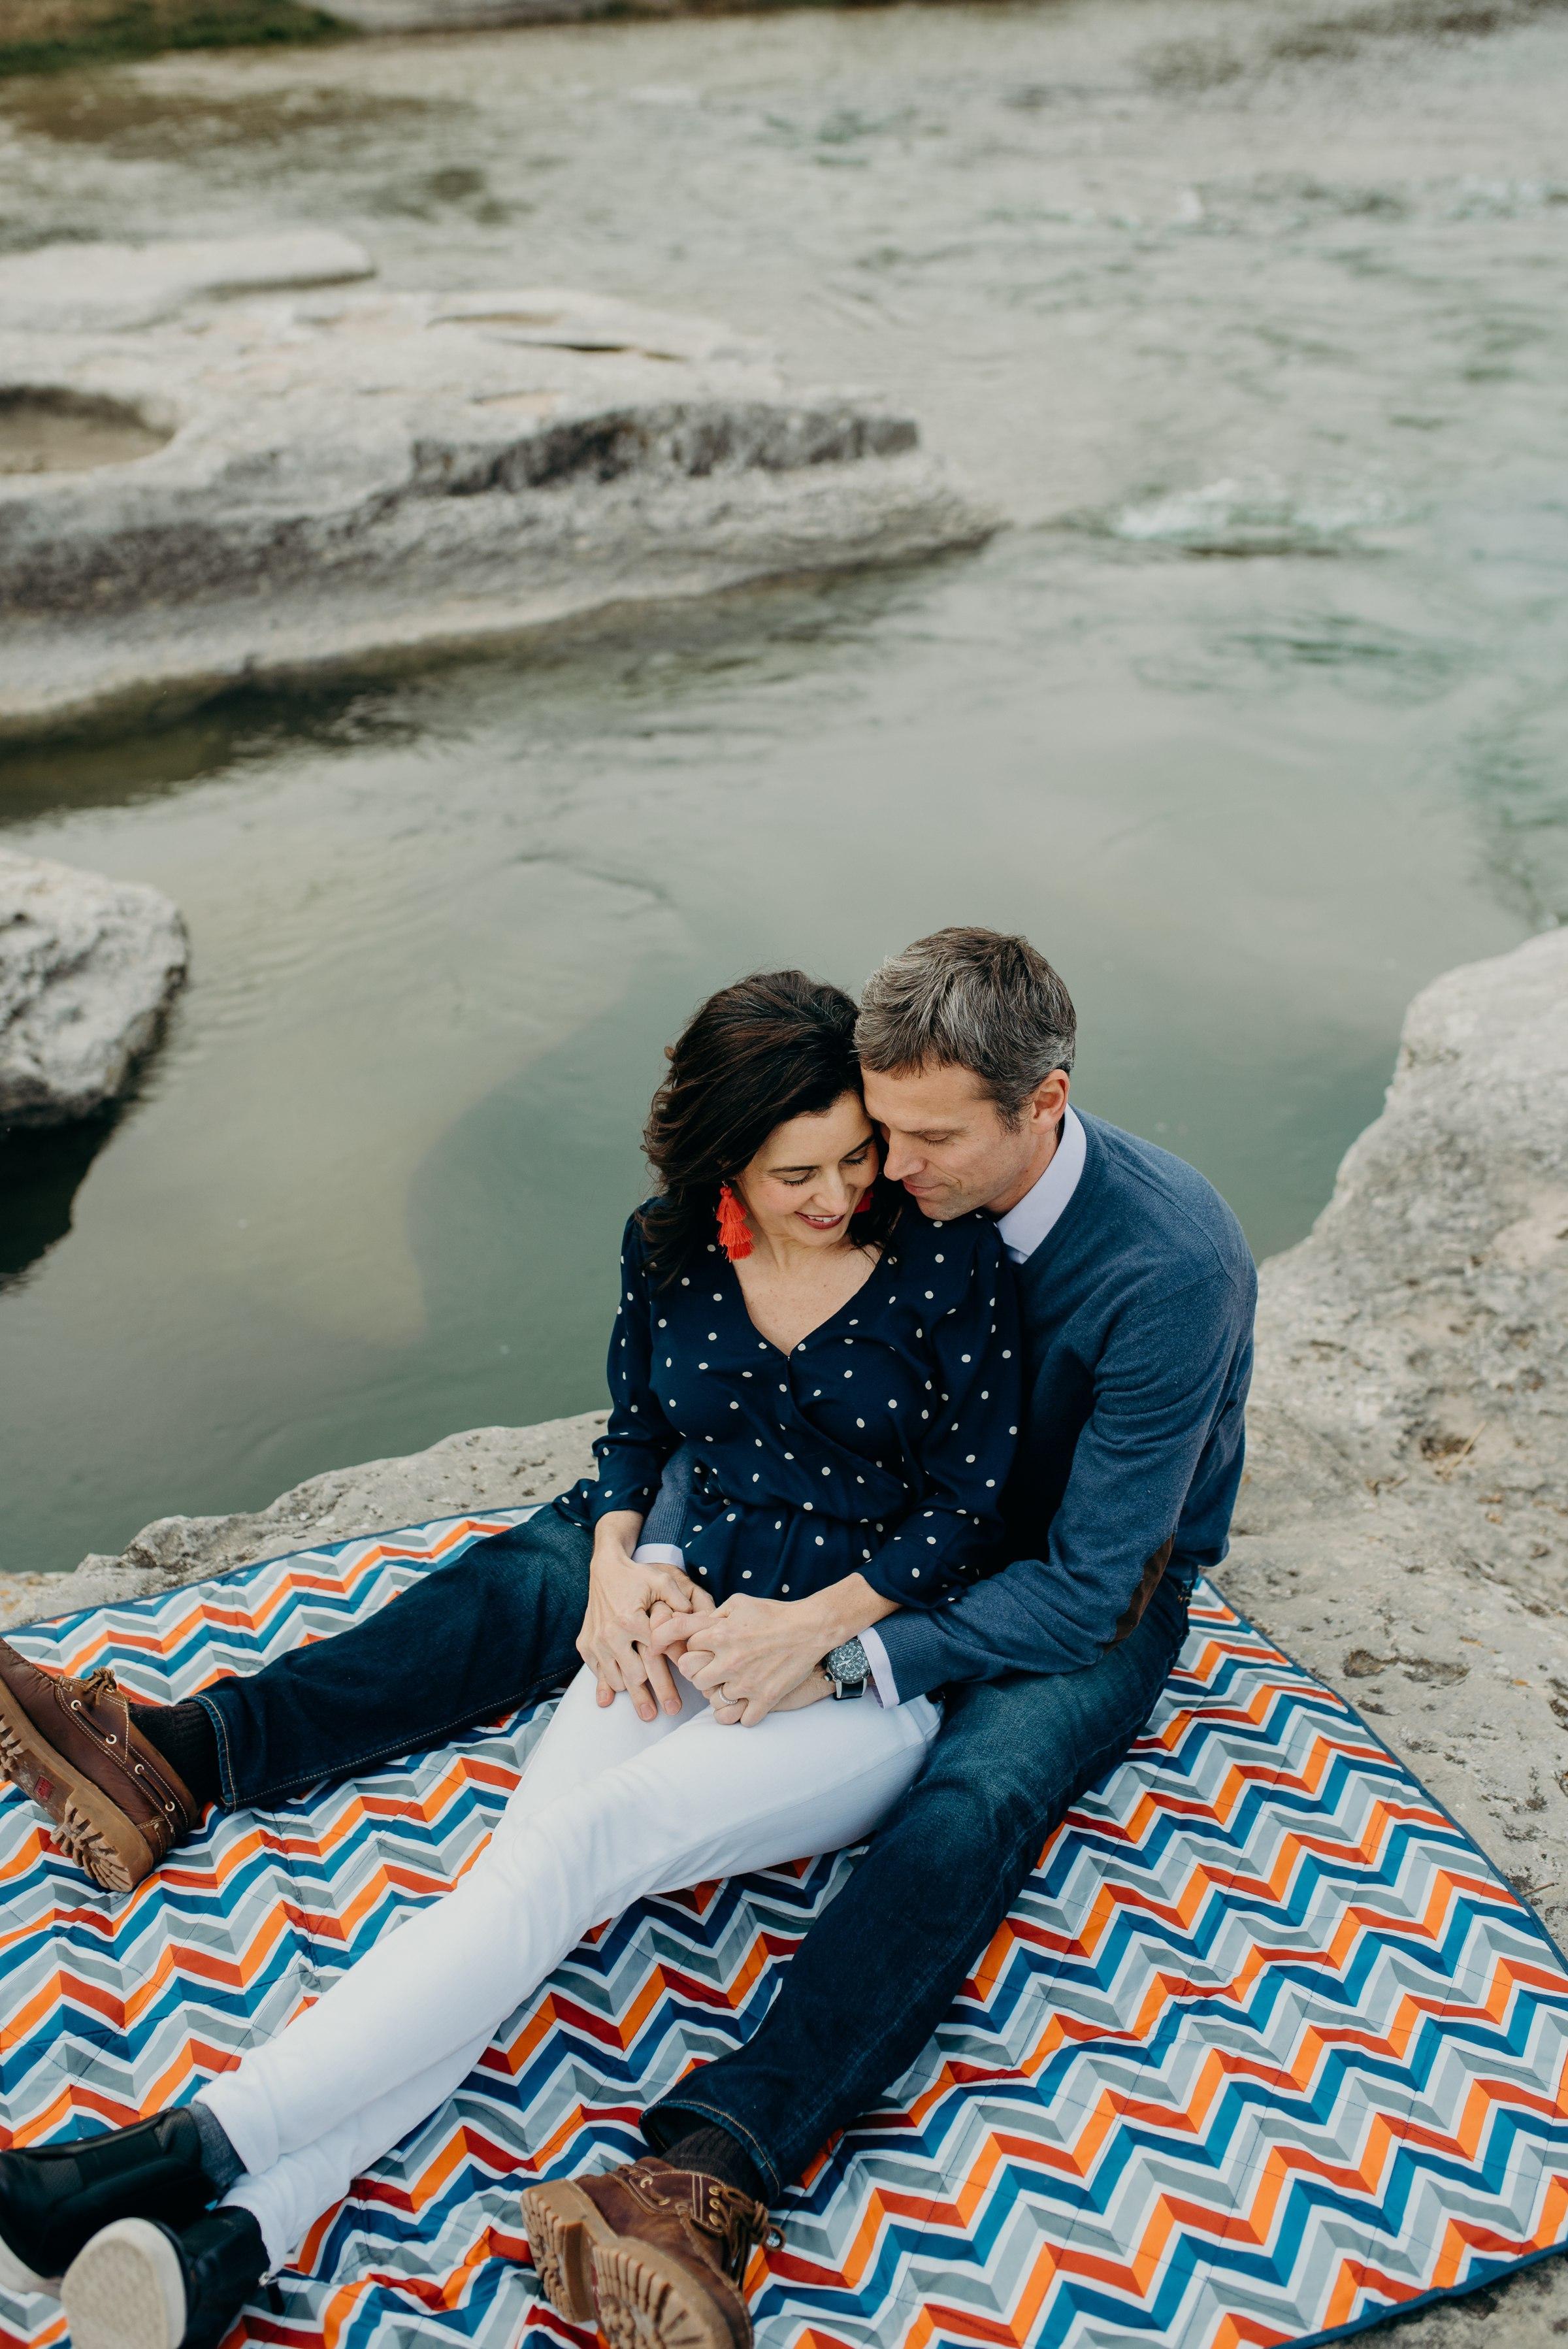 austin-mckinney-falls-engagement-photographer-elopement-prices-best-headshot-senior-adventurous-italy-minneapolis-texas-minnesota-dallas-houston-tulum-mexico_0018.jpg